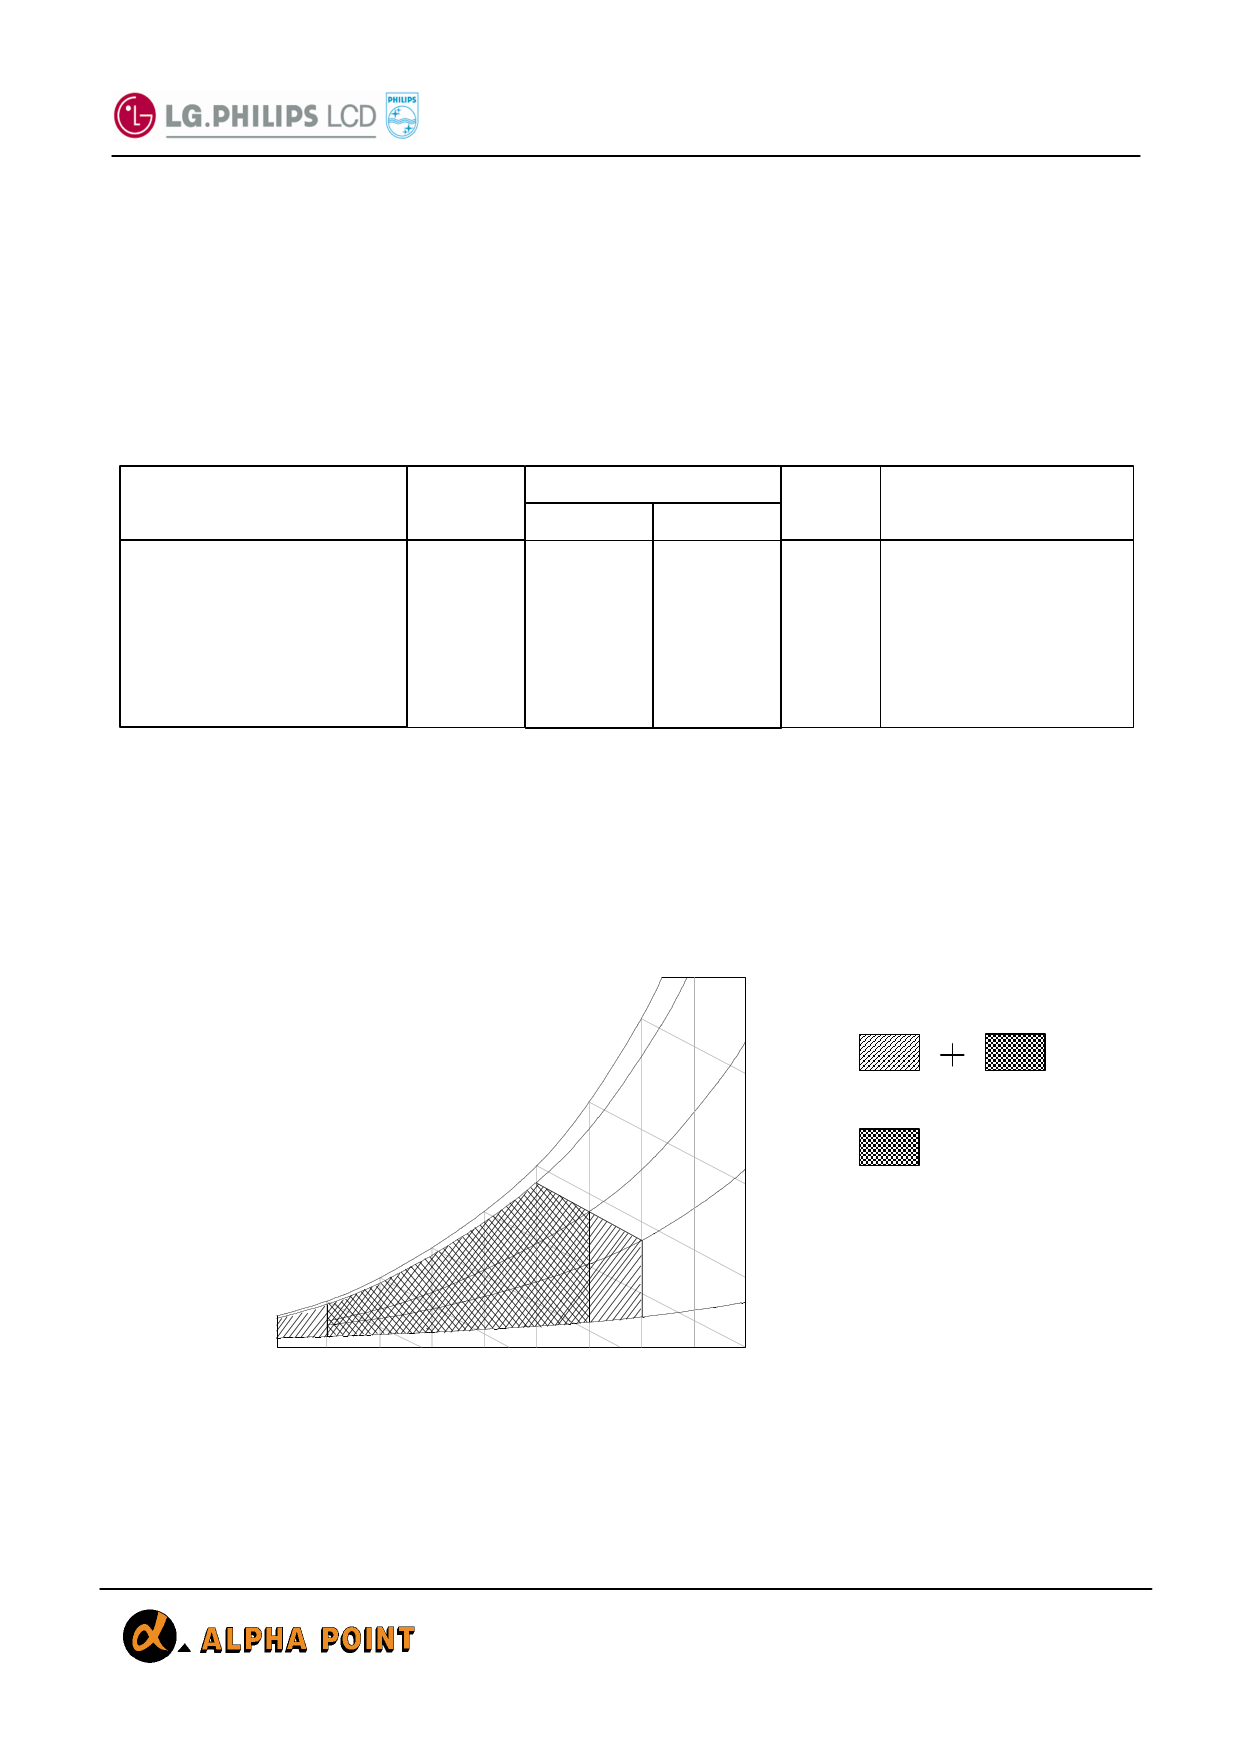 LC104S1-A1 pdf